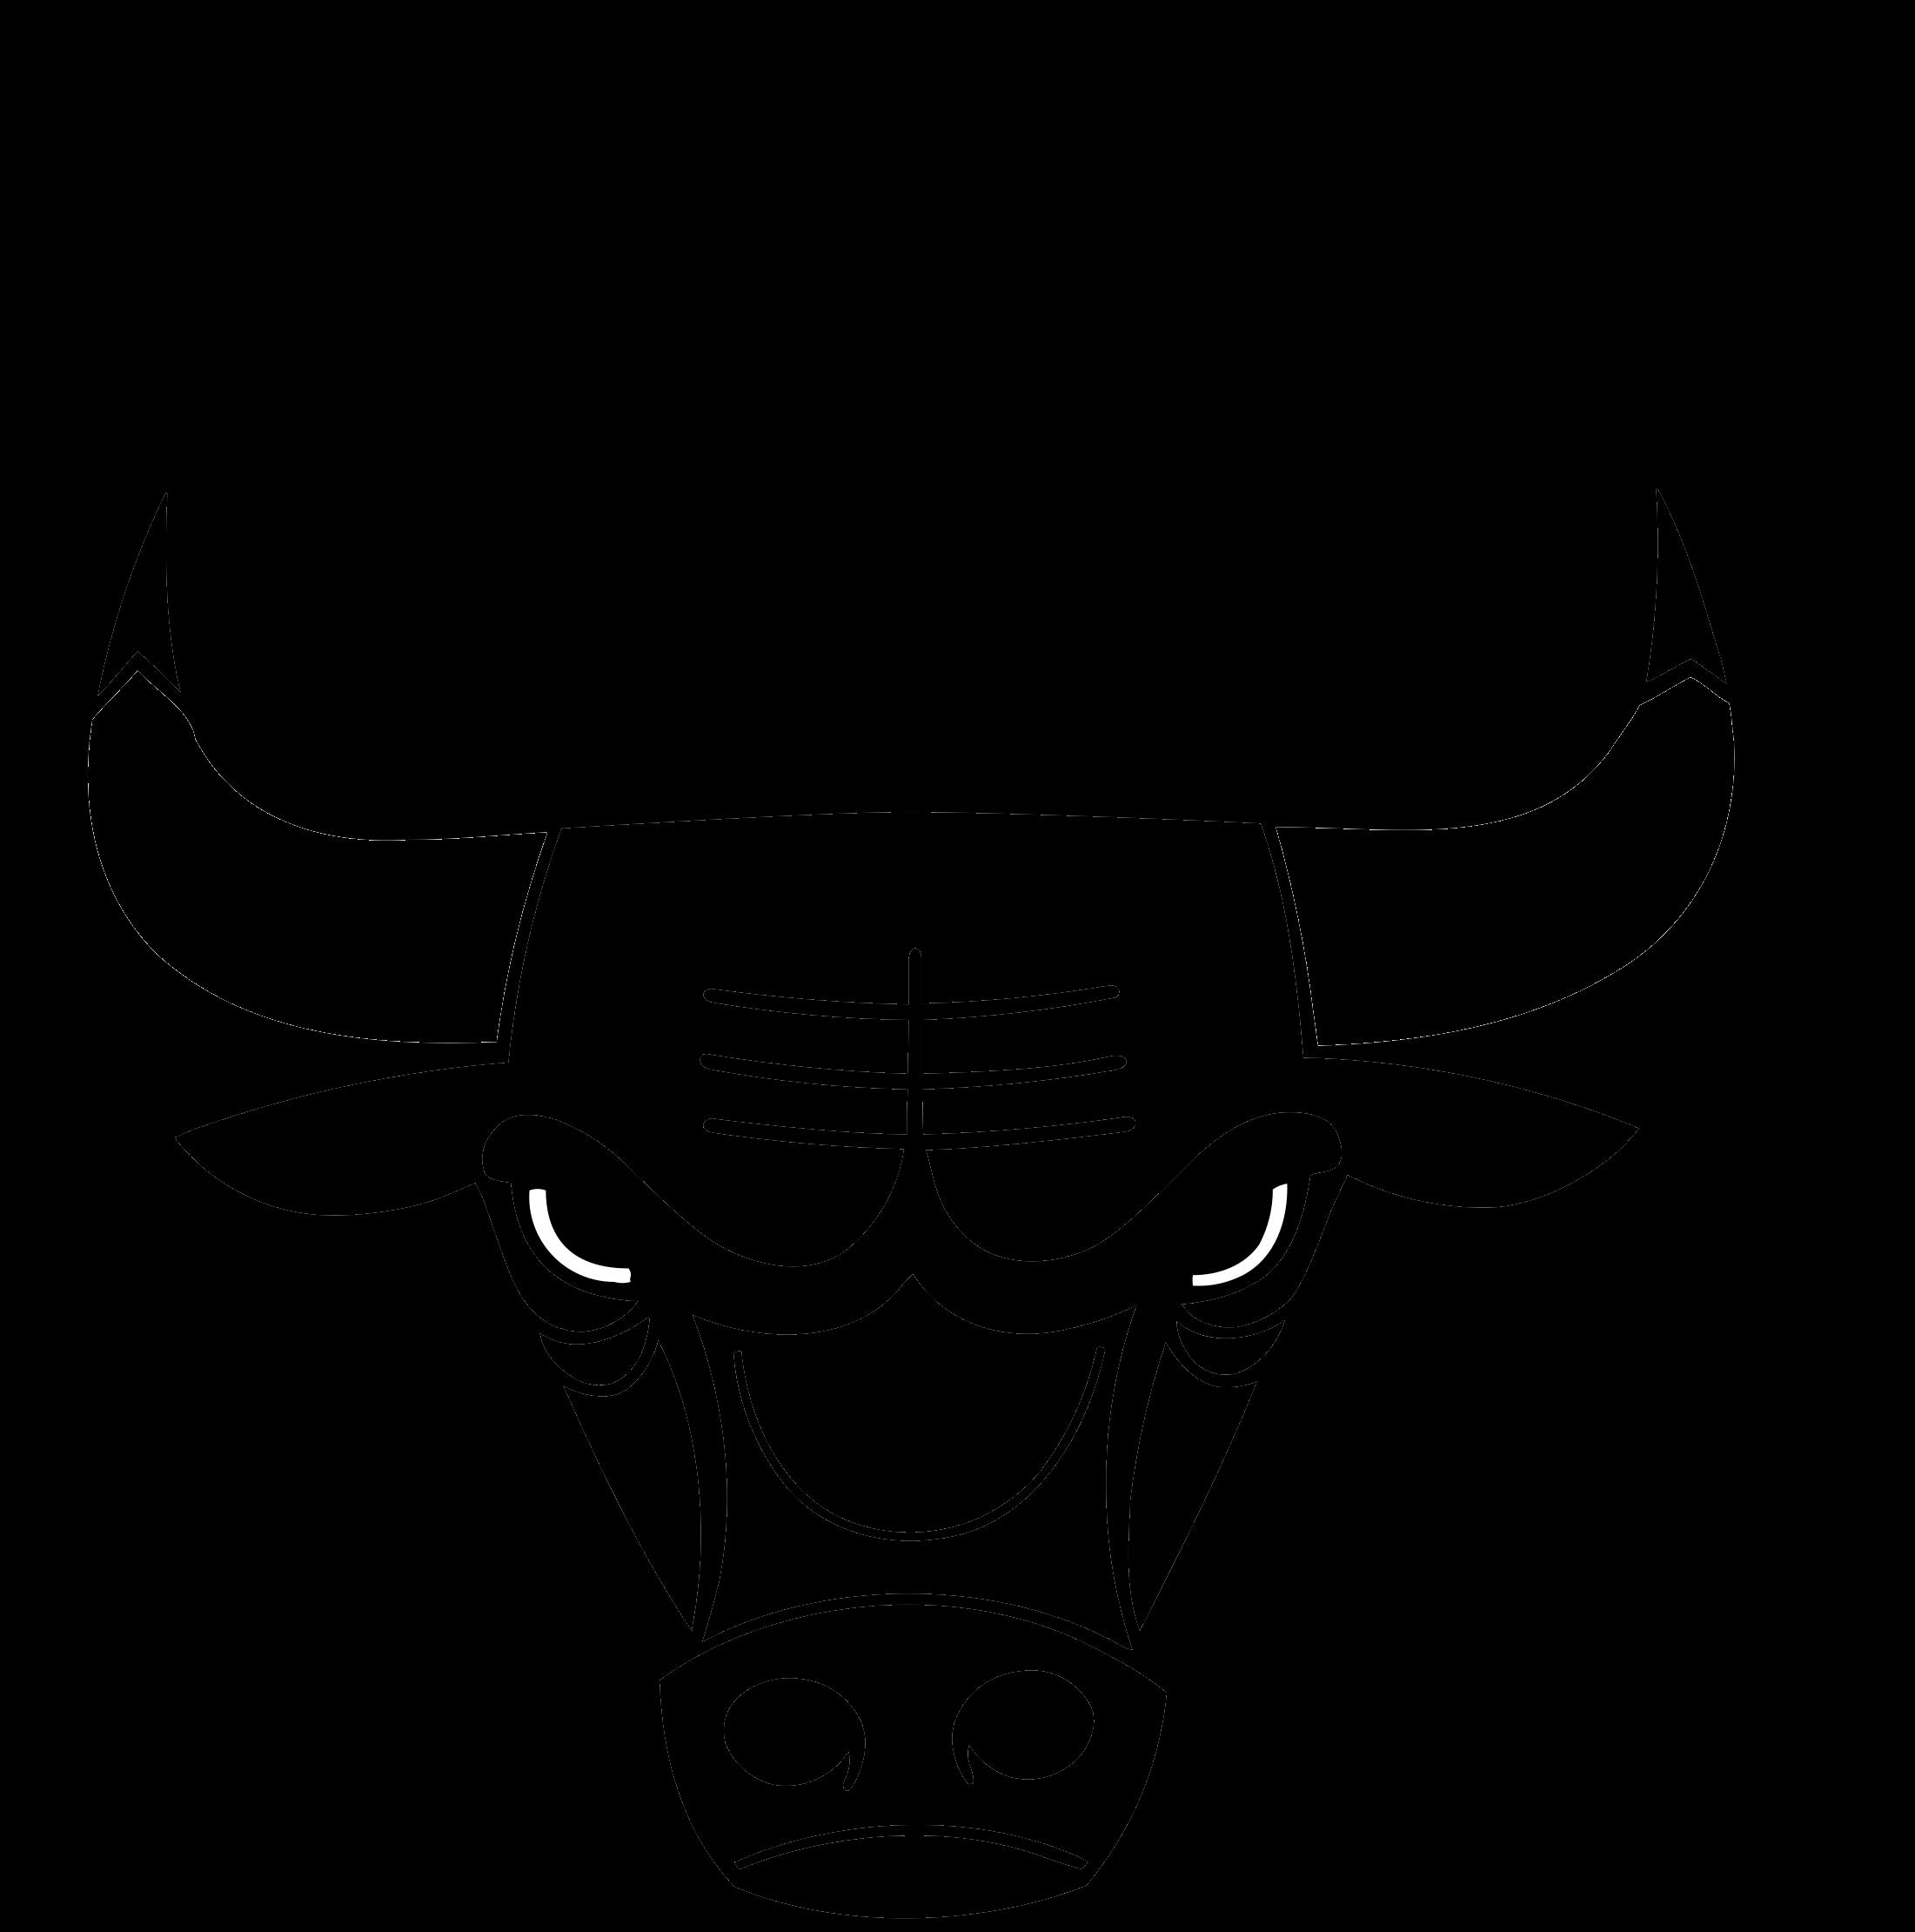 Download Hd Chicago Bulls Logo Png Transparent Chicago Bulls